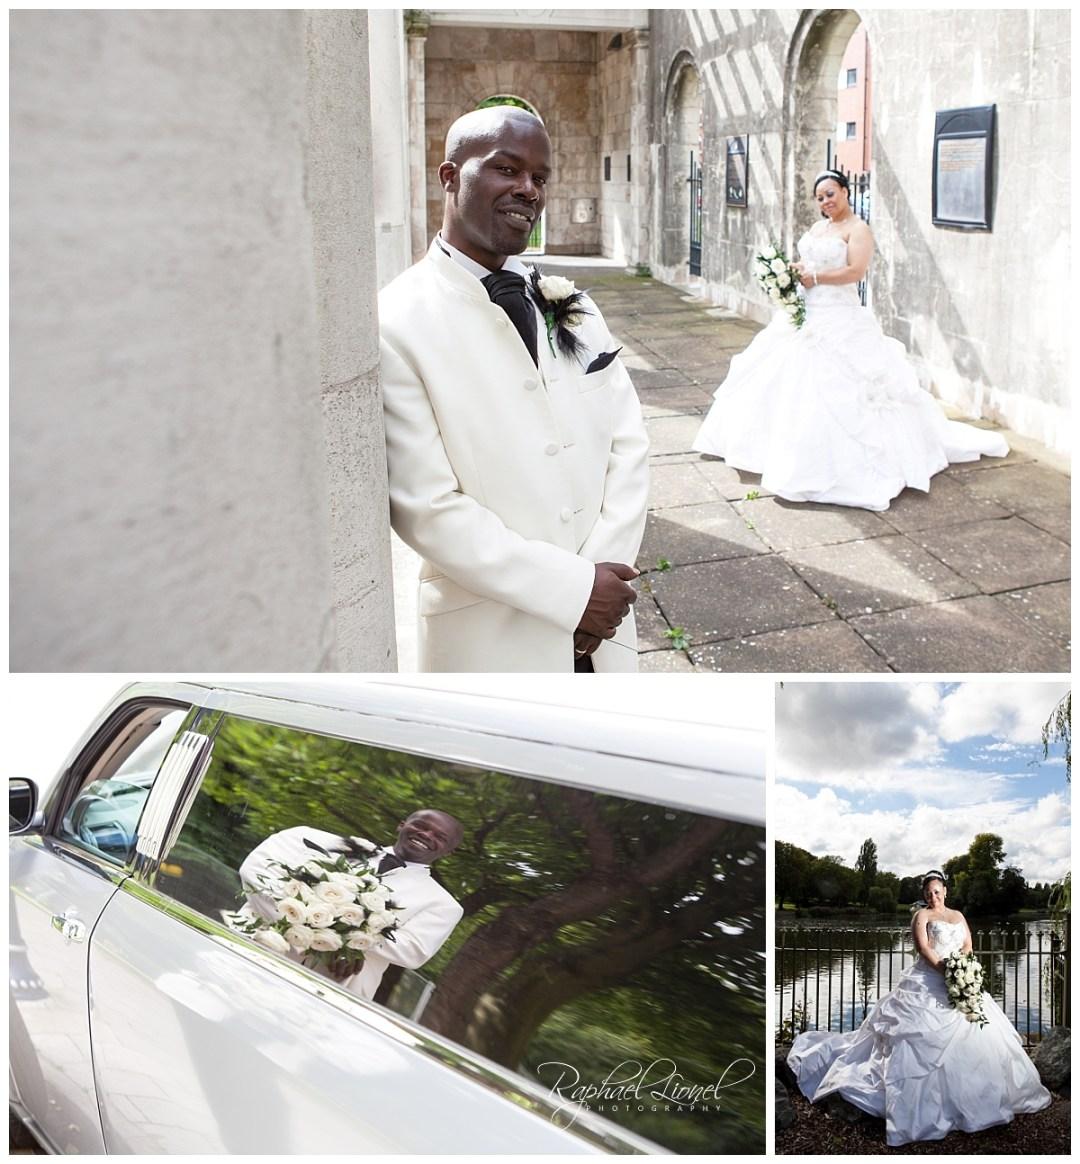 2018 04 08 0013 - City Wedding Birmingham | Dauntley and Simone